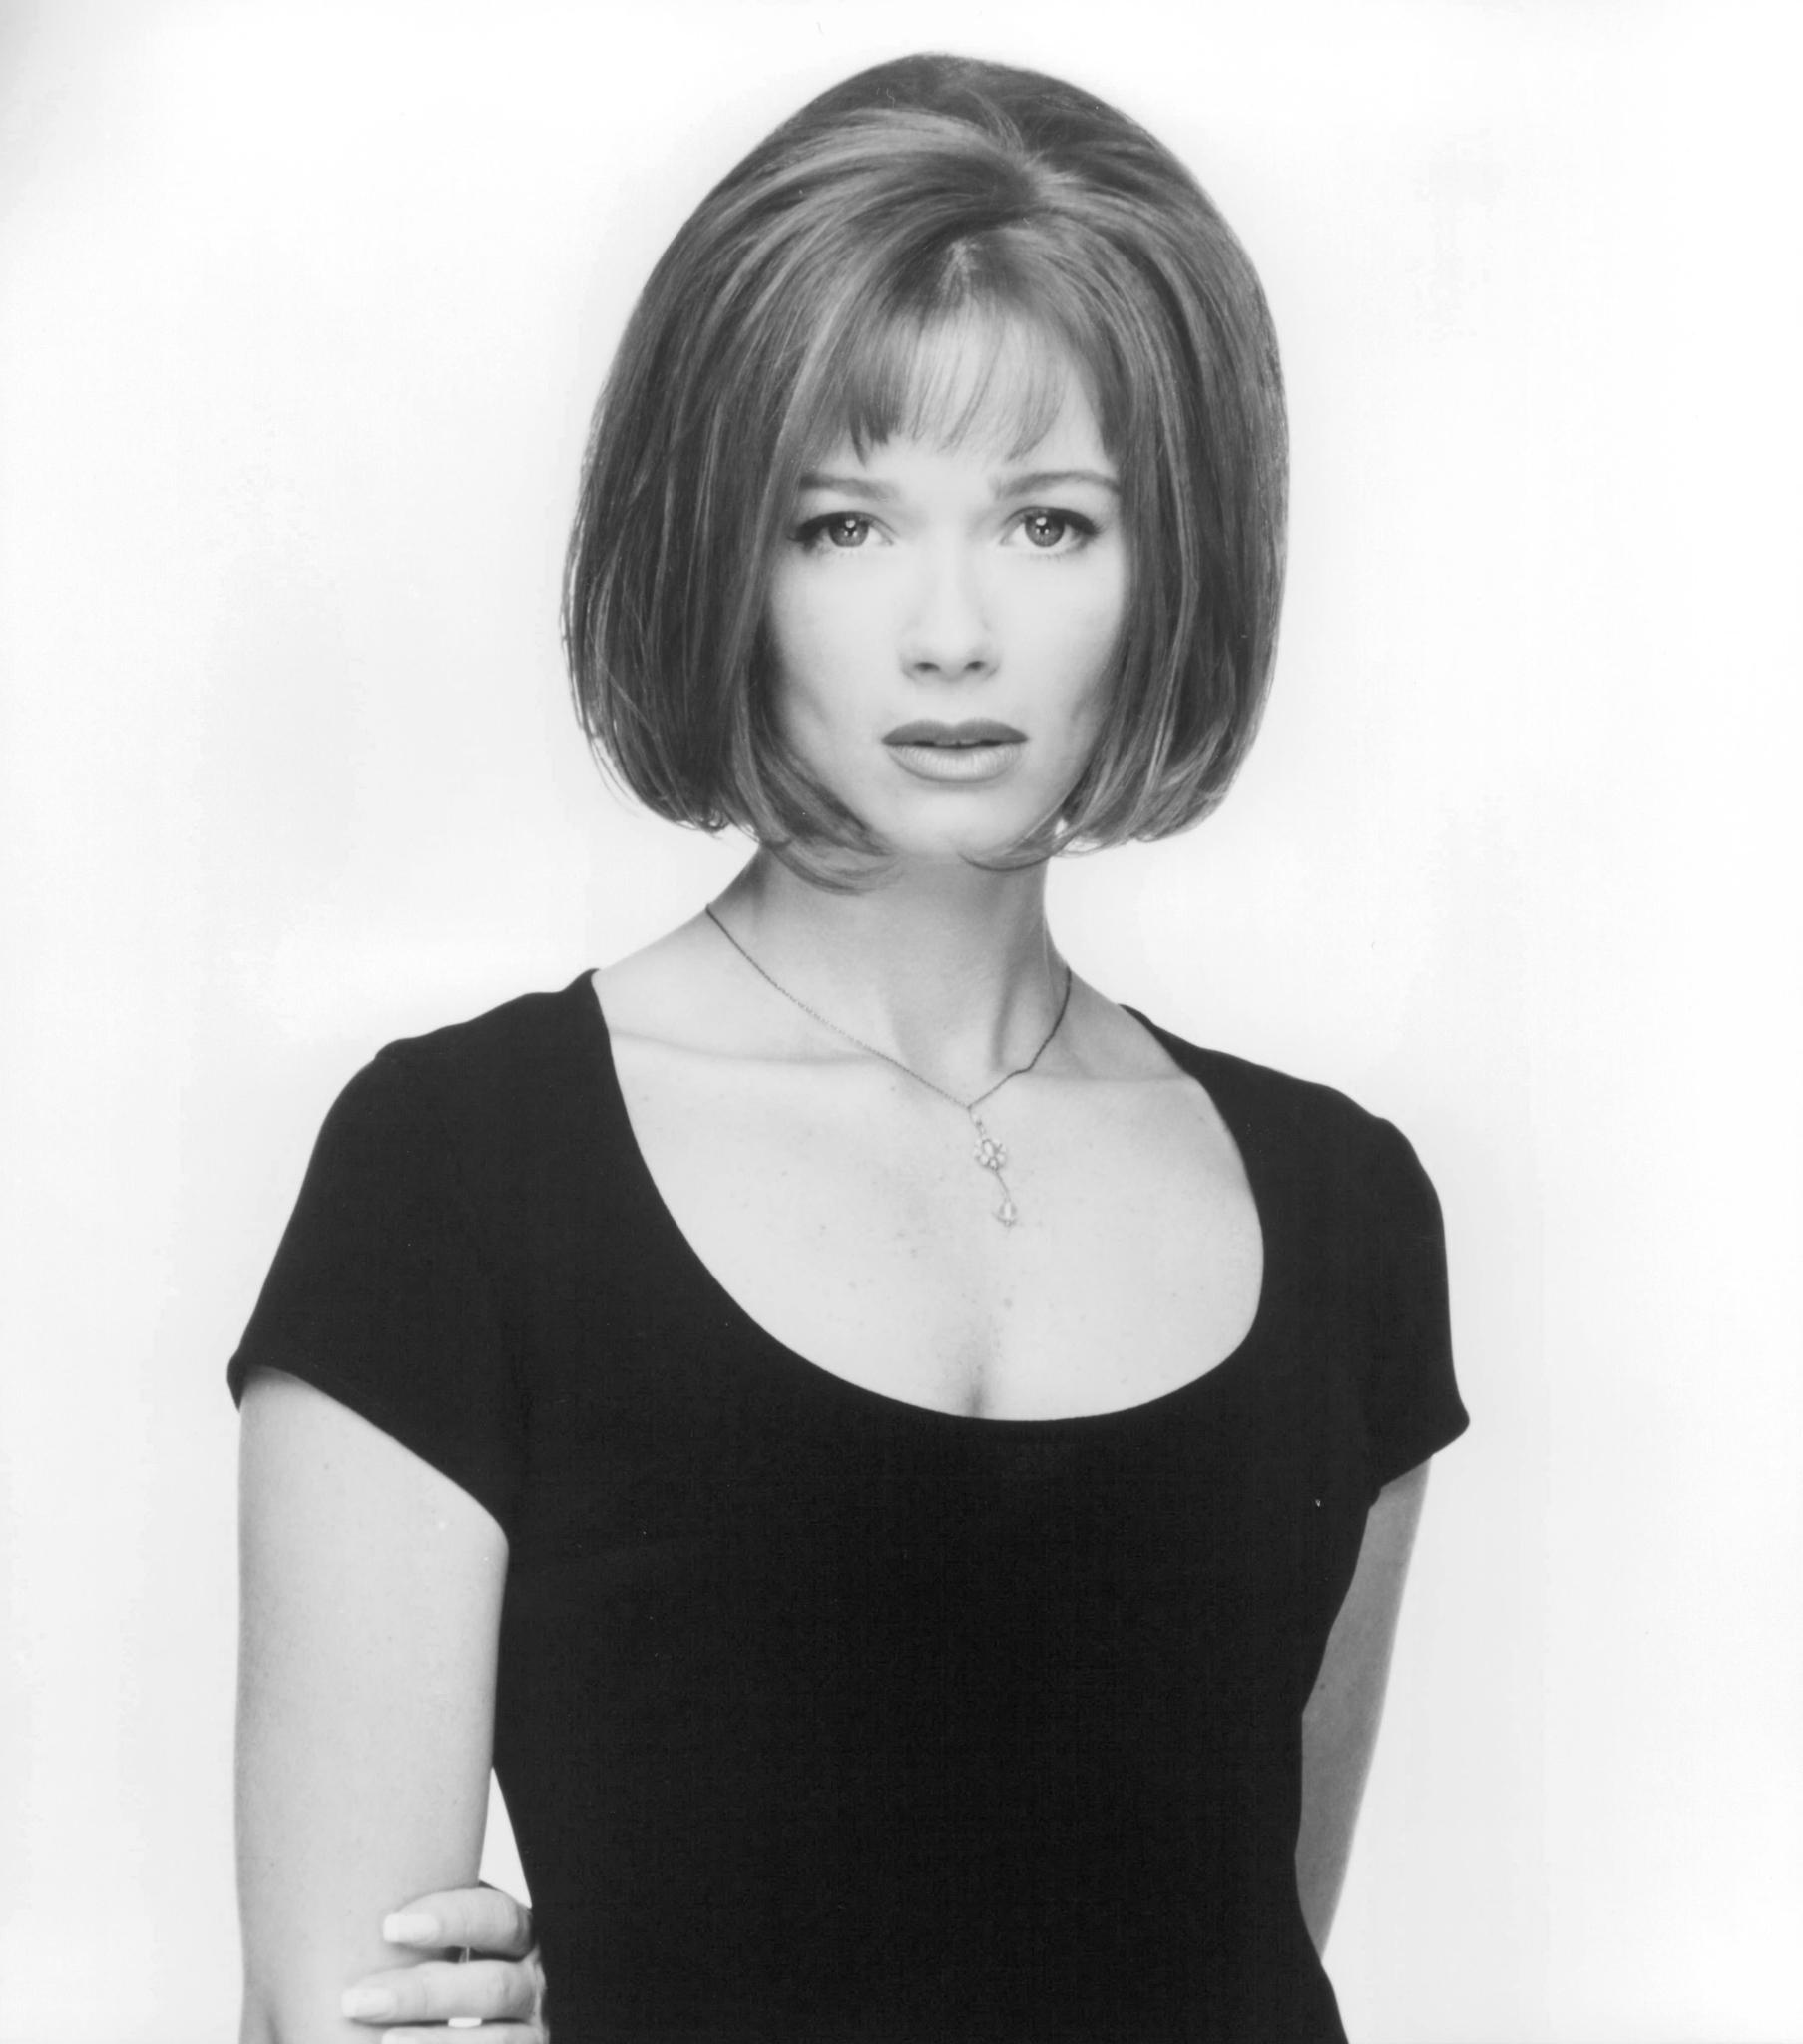 Lauren Holly in Dumb and Dumber (1994)